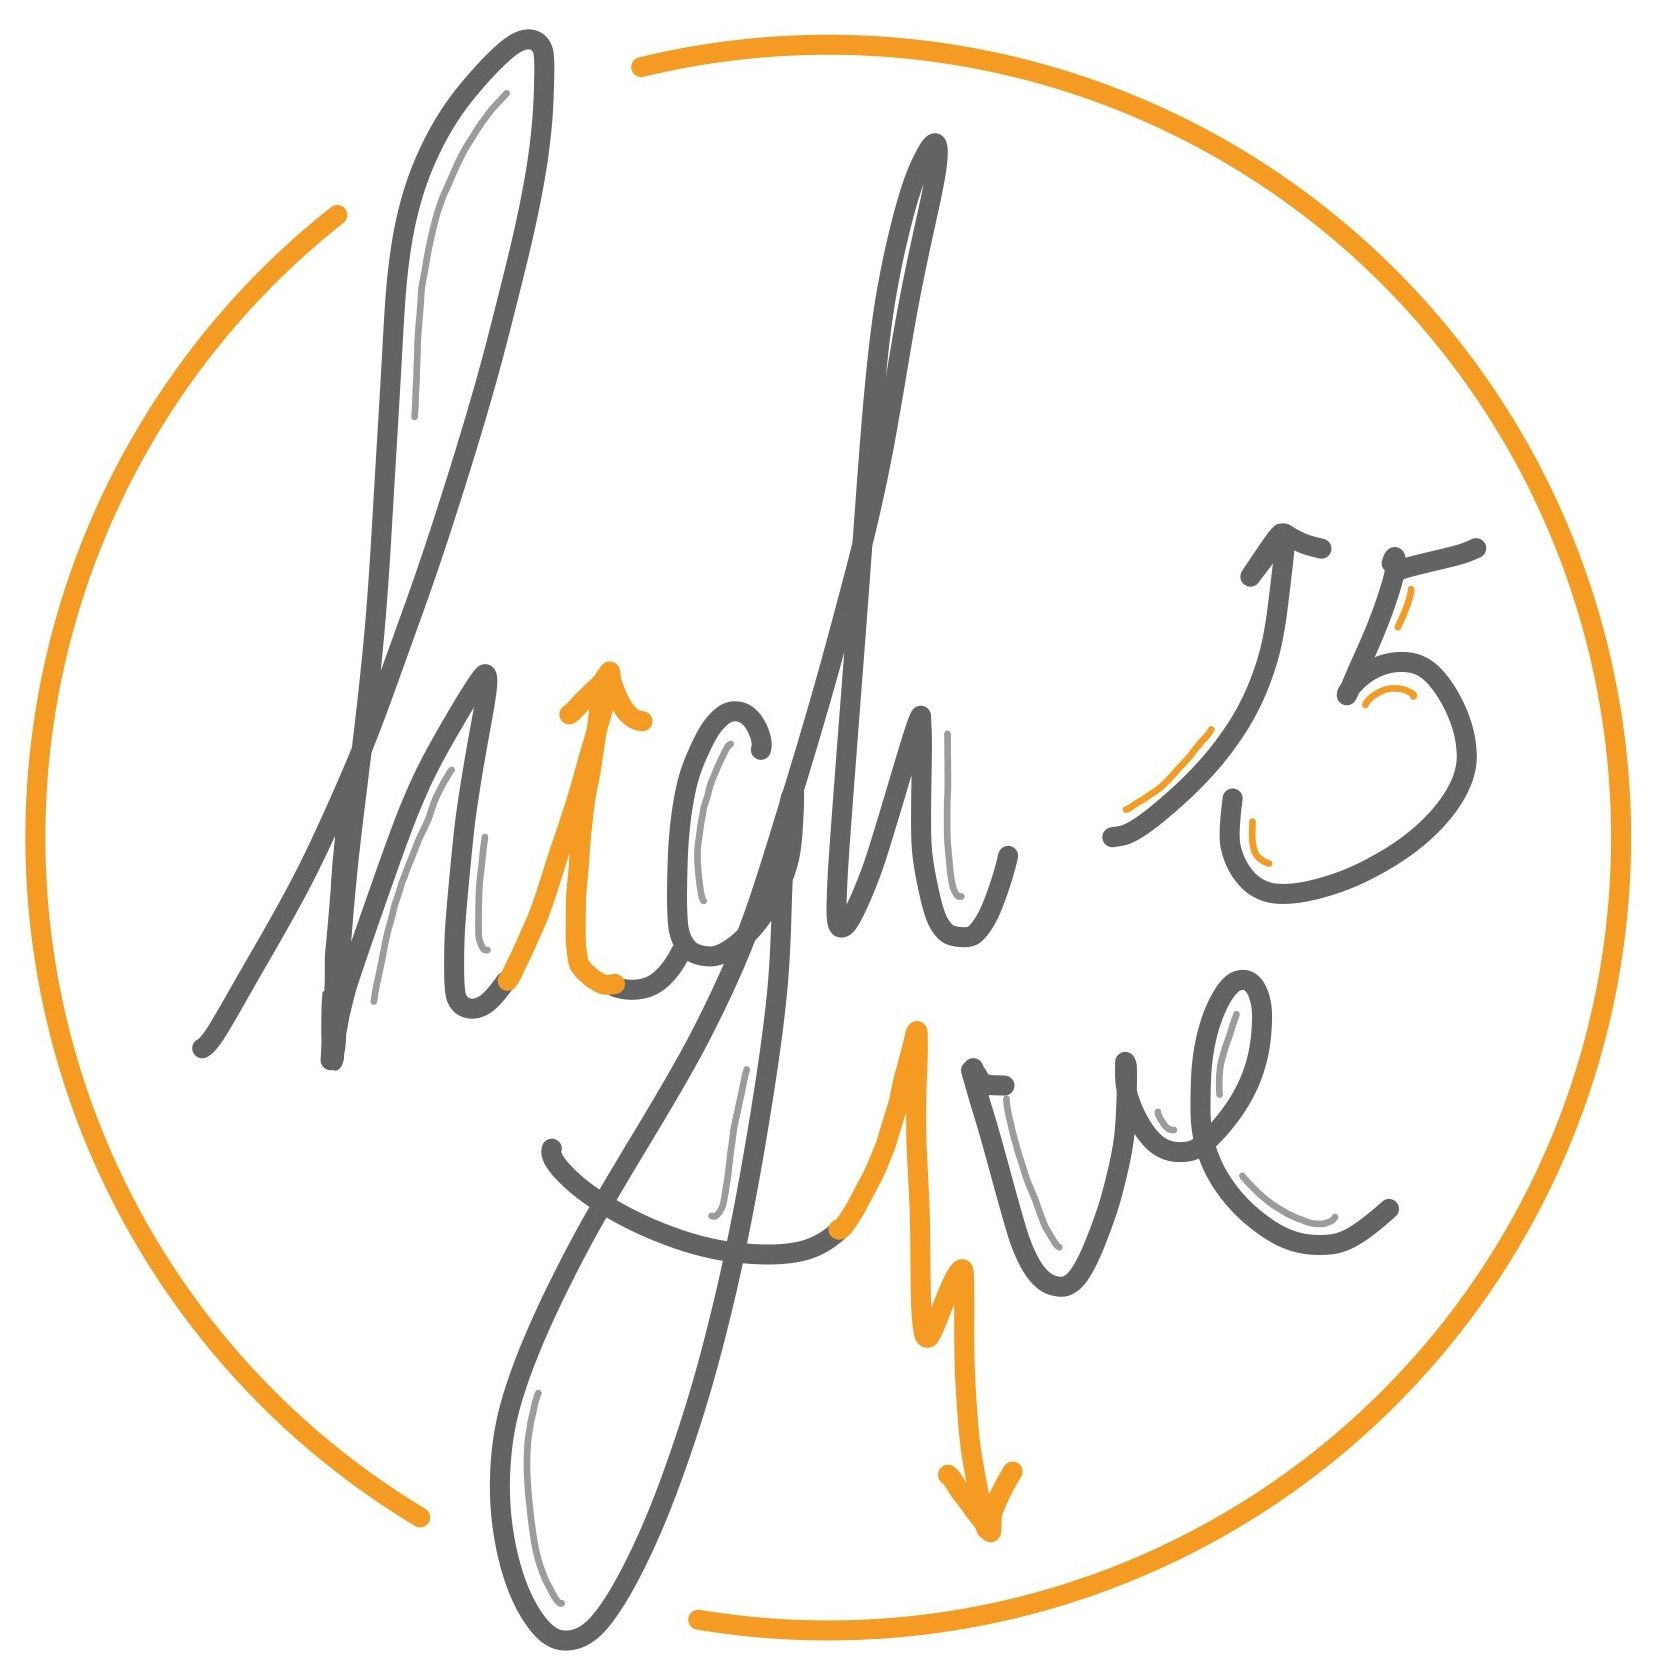 Wort-/Bildmarke: high five 5